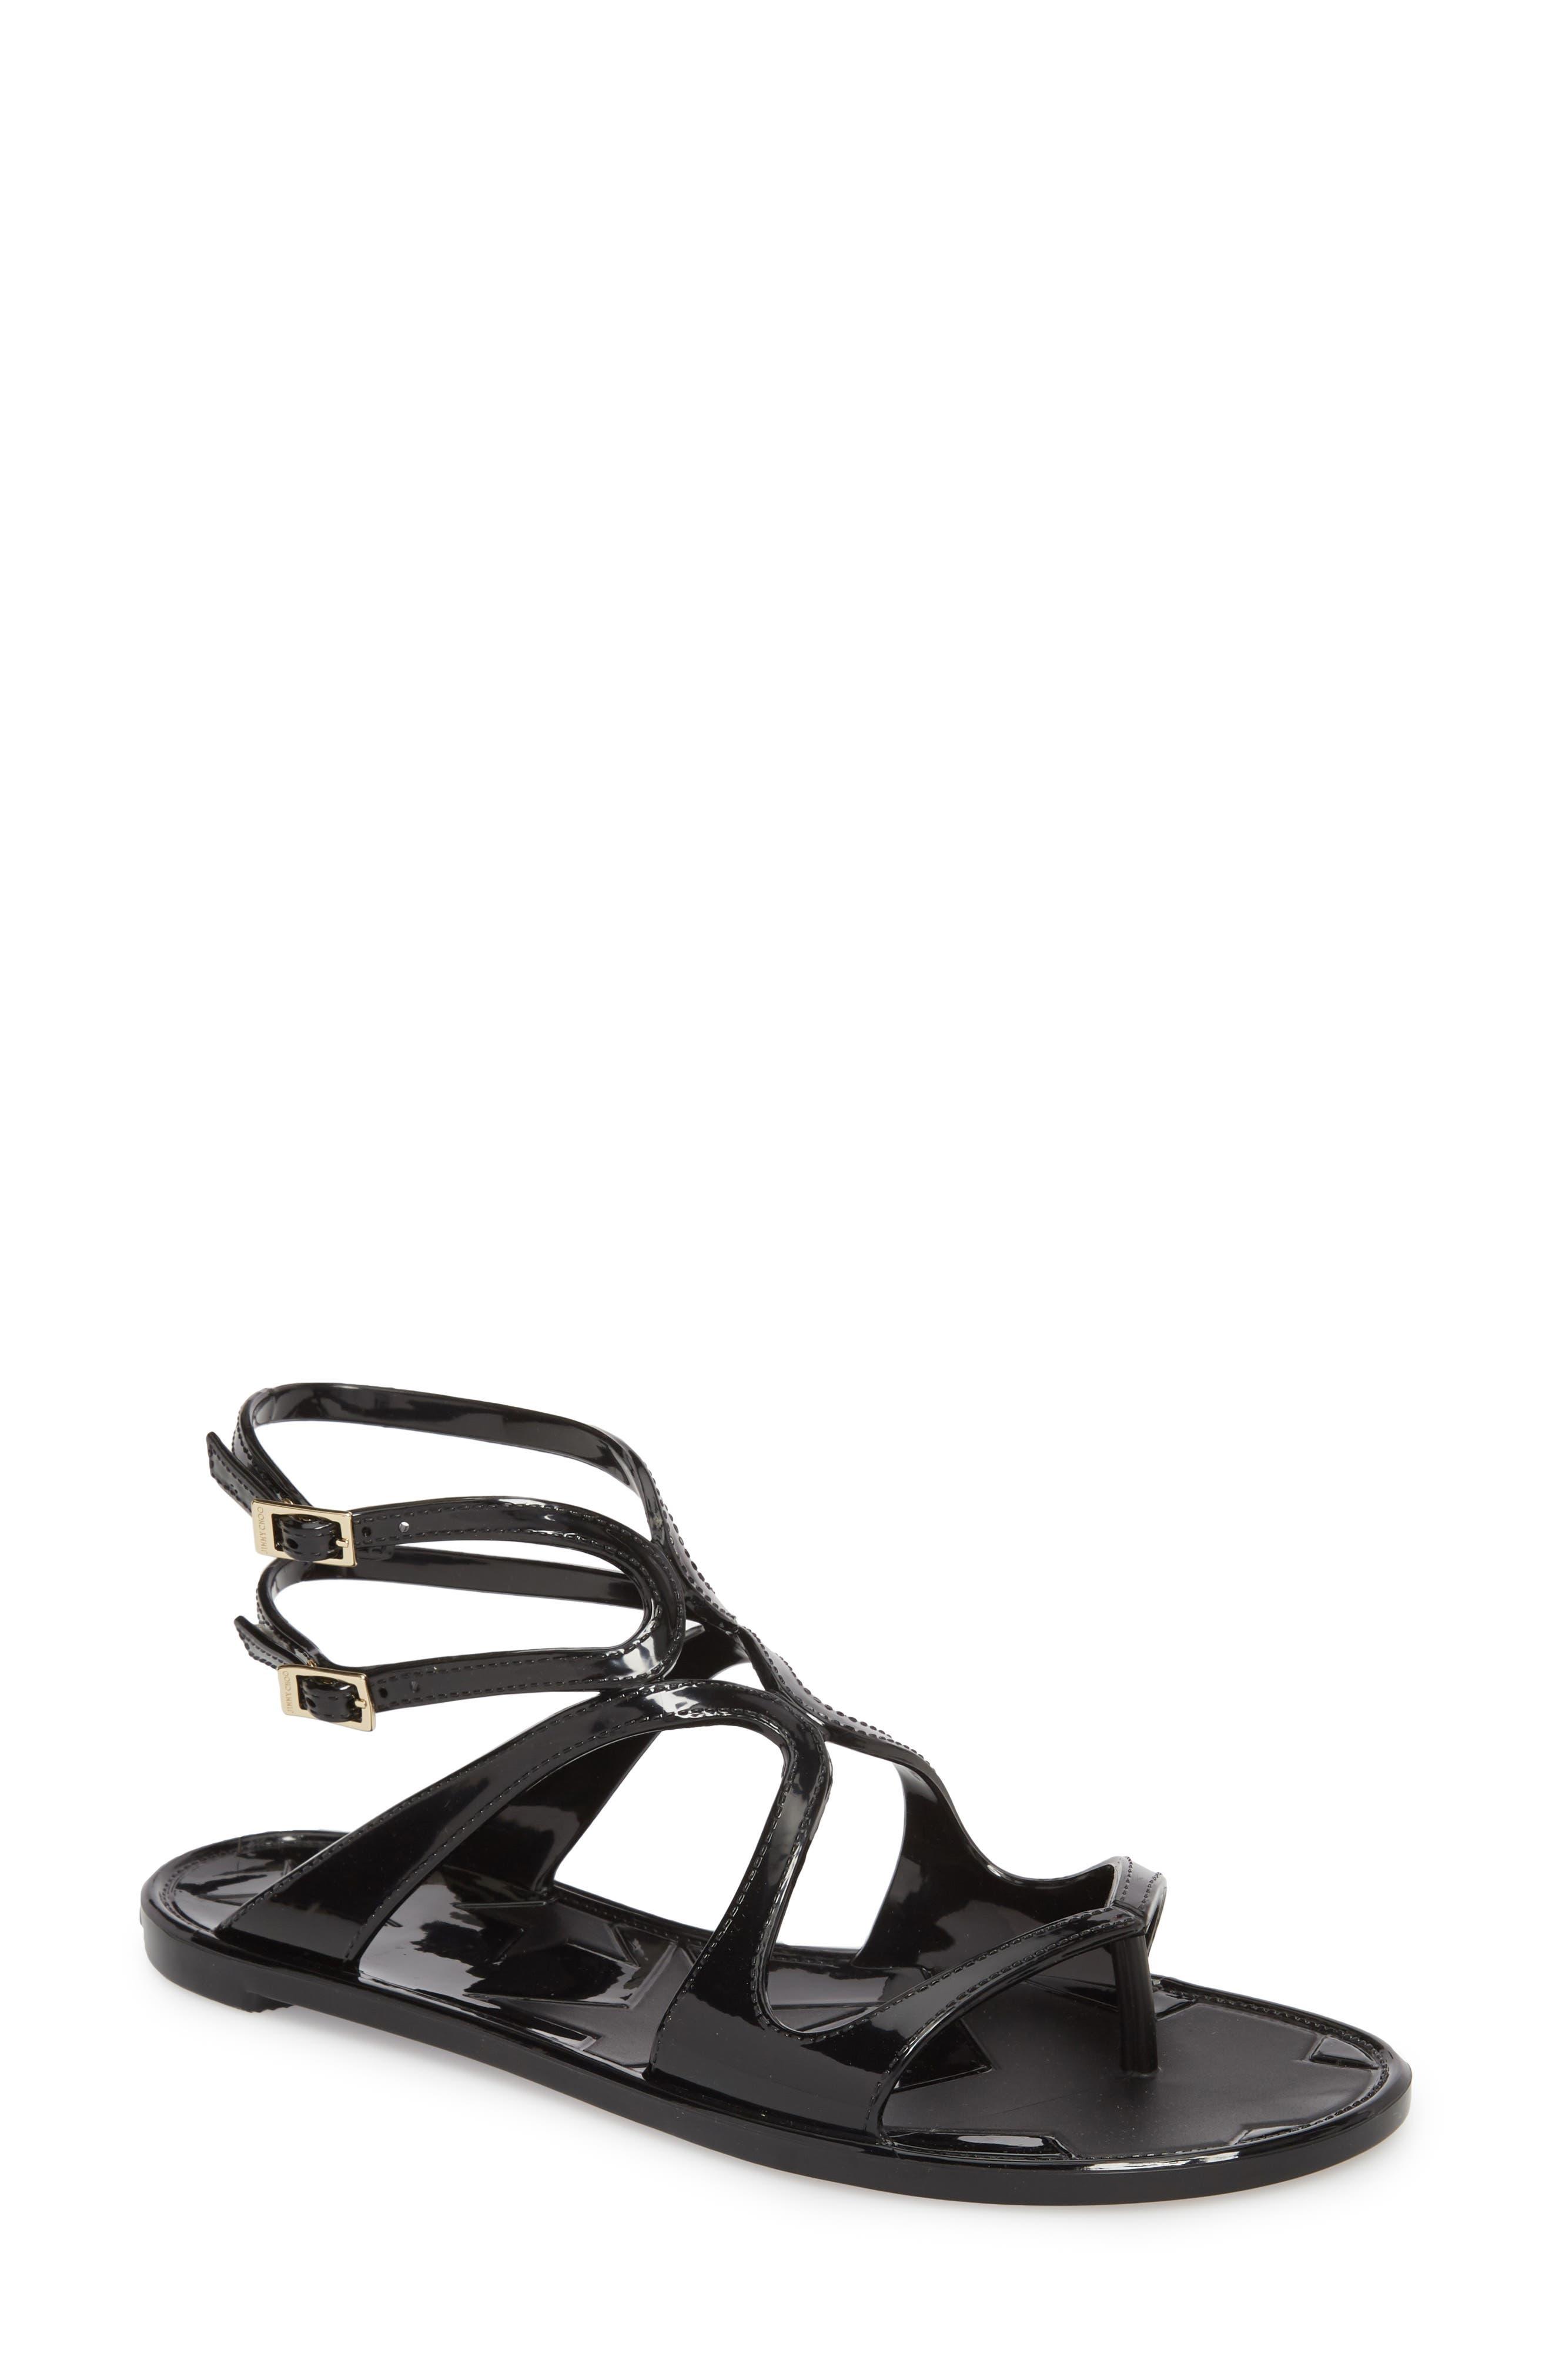 Women\'s Jimmy Choo Flat Sandals   Nordstrom